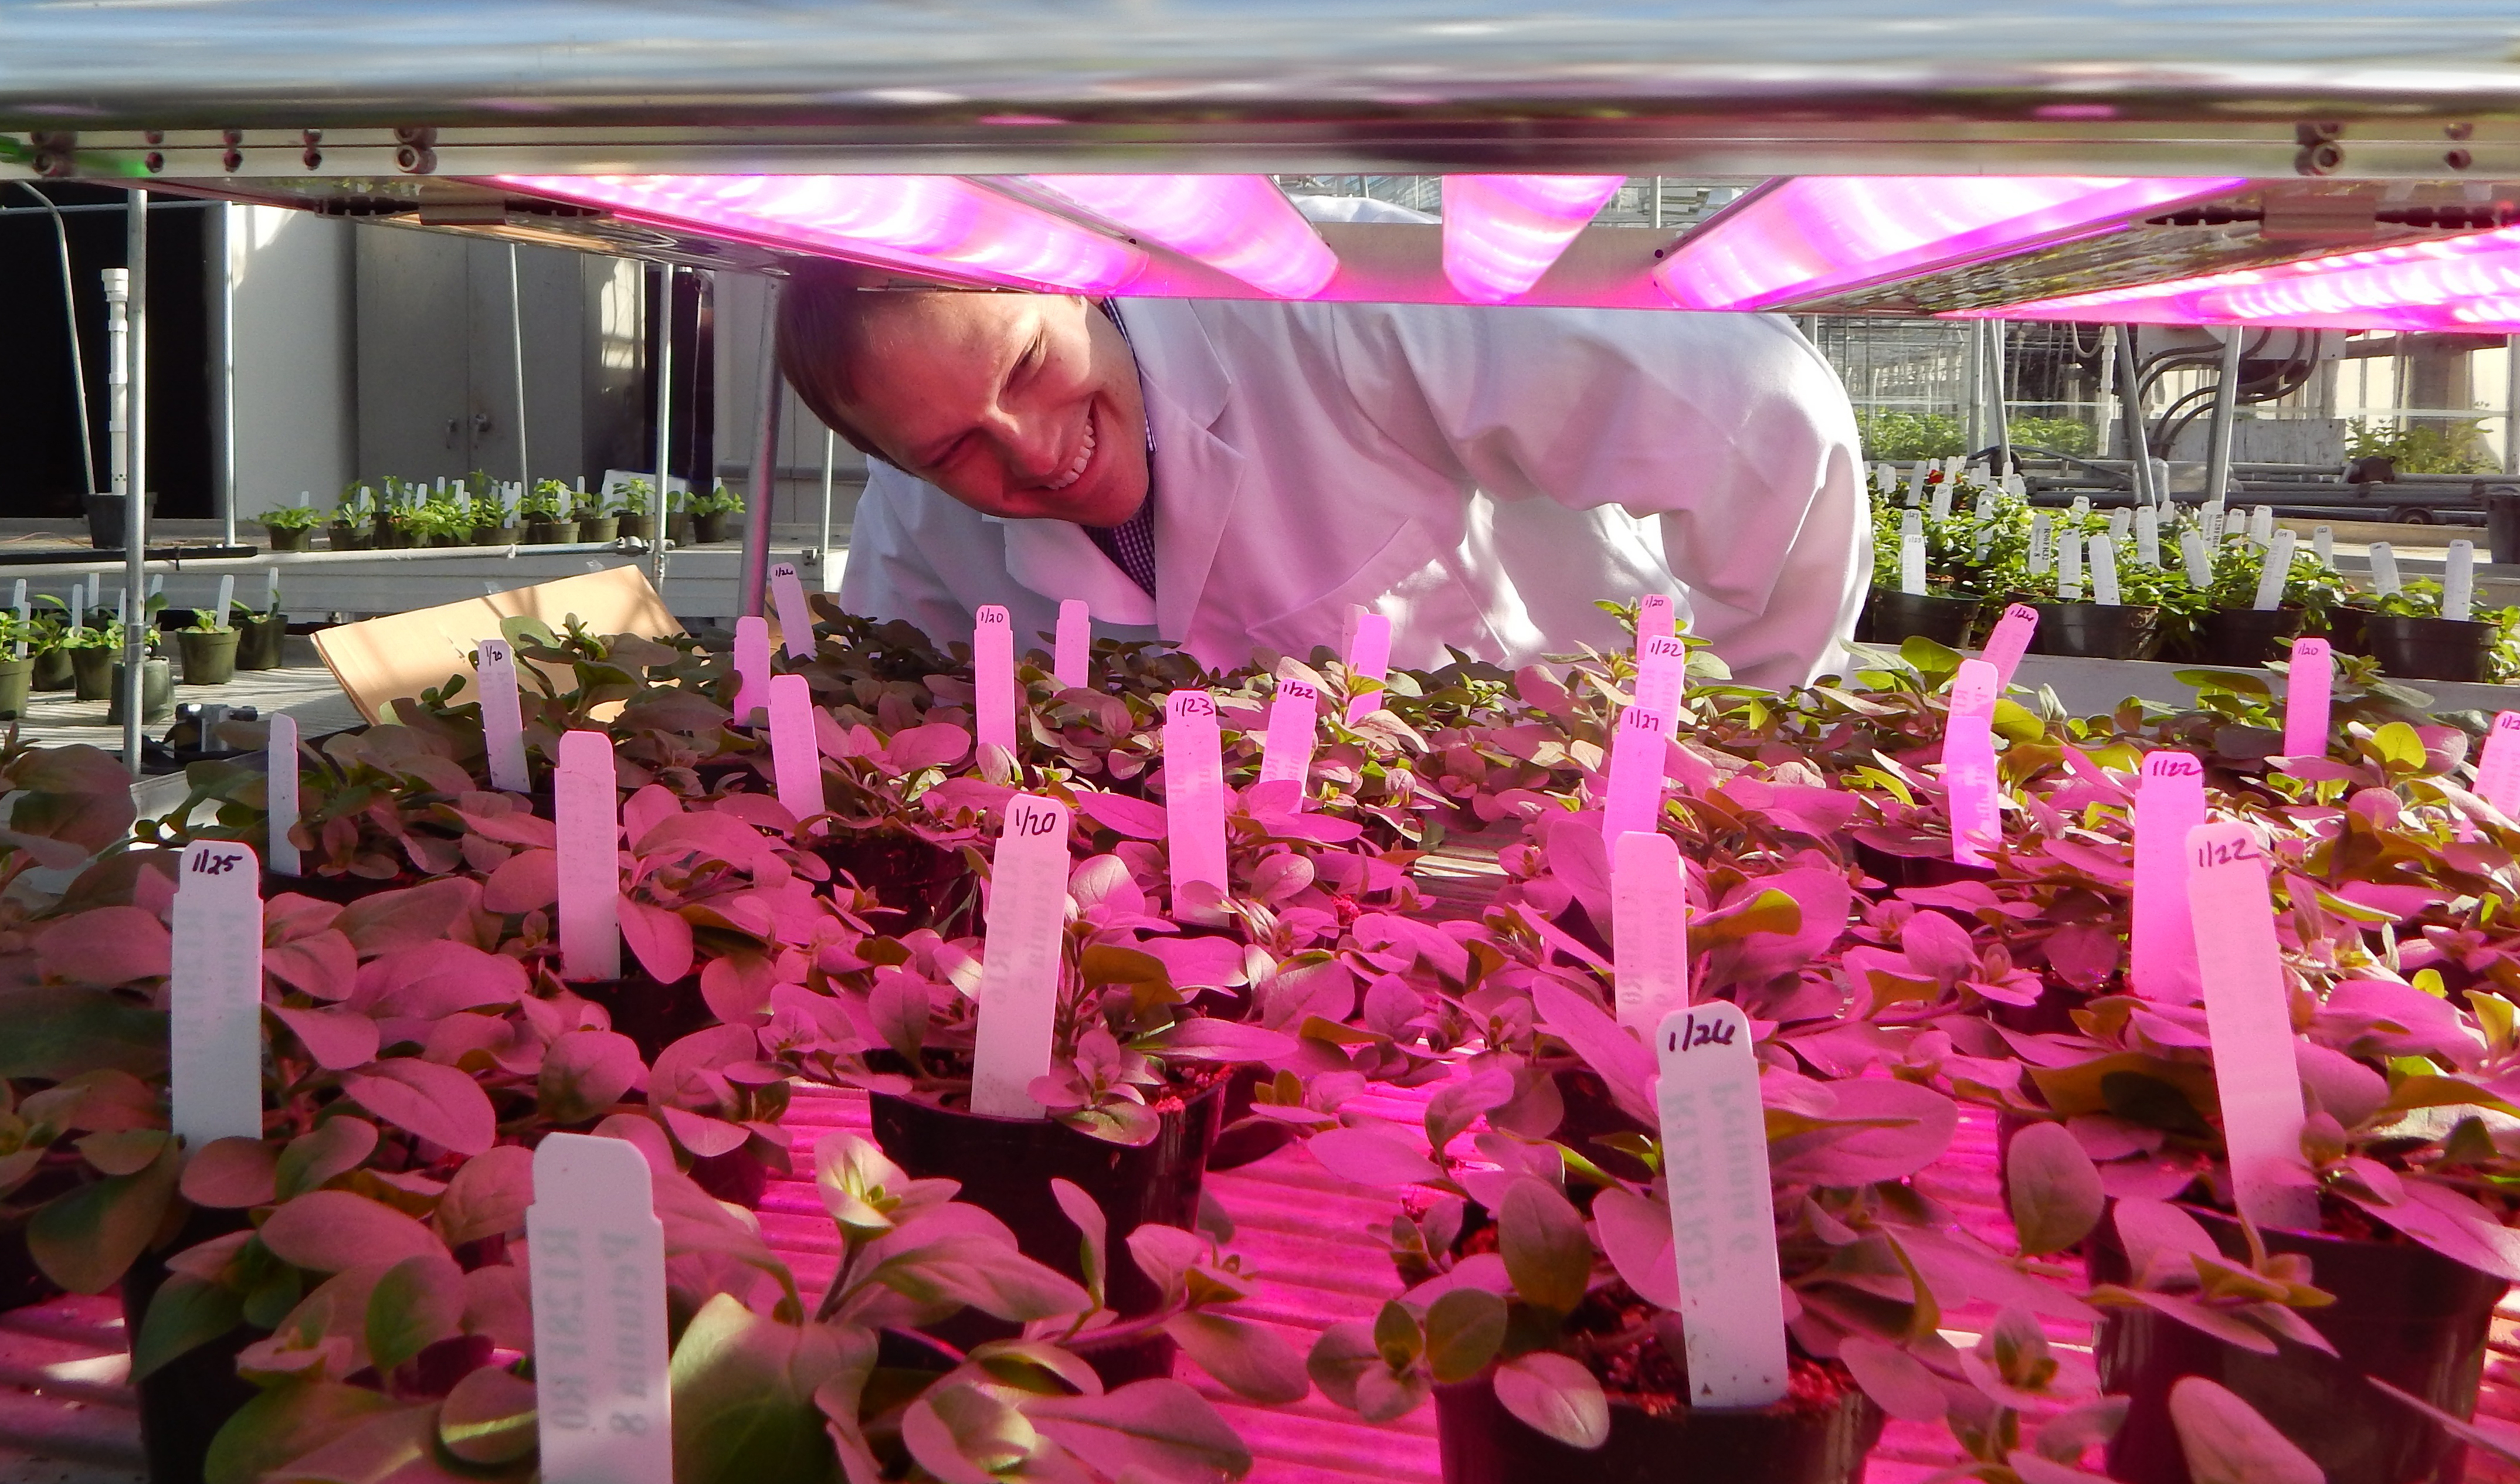 Gezielte Beleuchtung beim Vertical Farming (Interlighting)